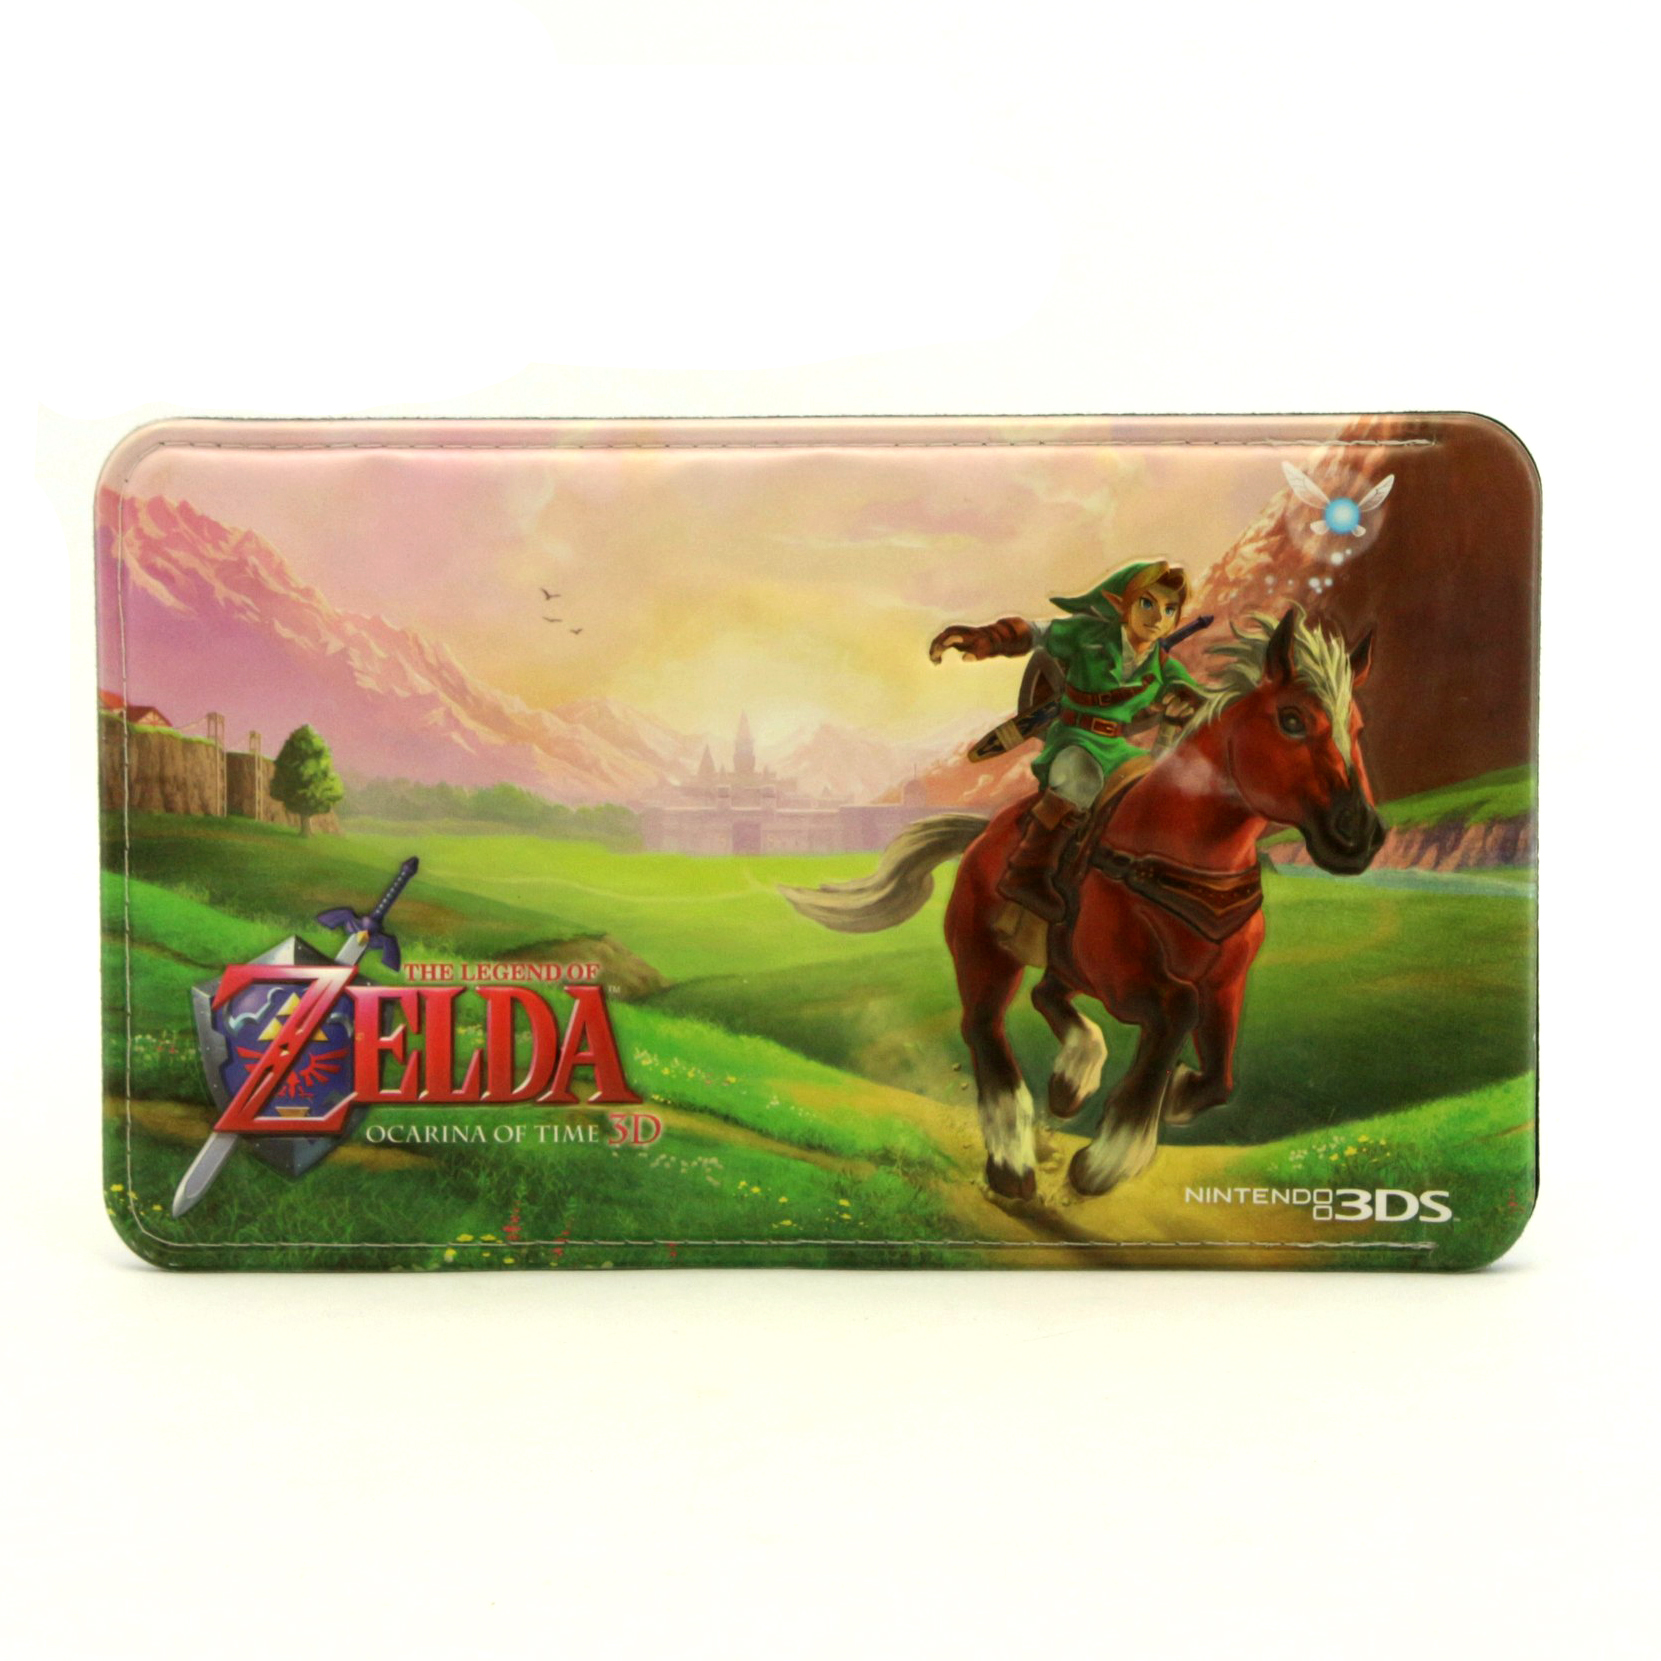 Original 3DS Tasche The Legend of Zelda: Ocarina of Time 3D